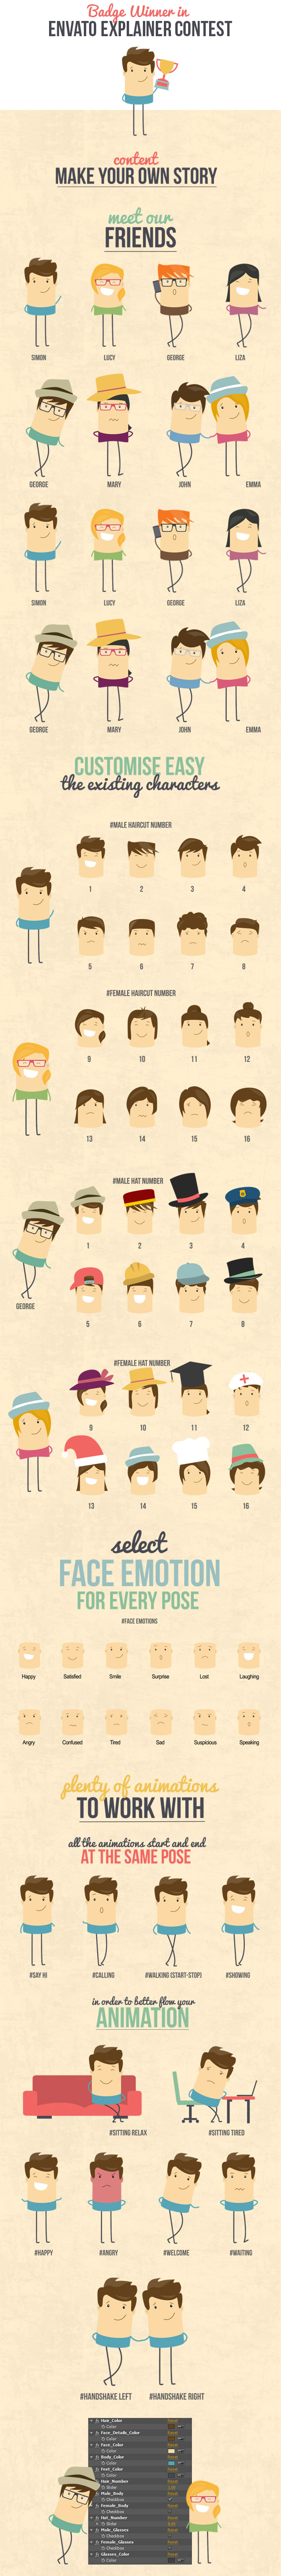 PremiumBuilder Characters - 27